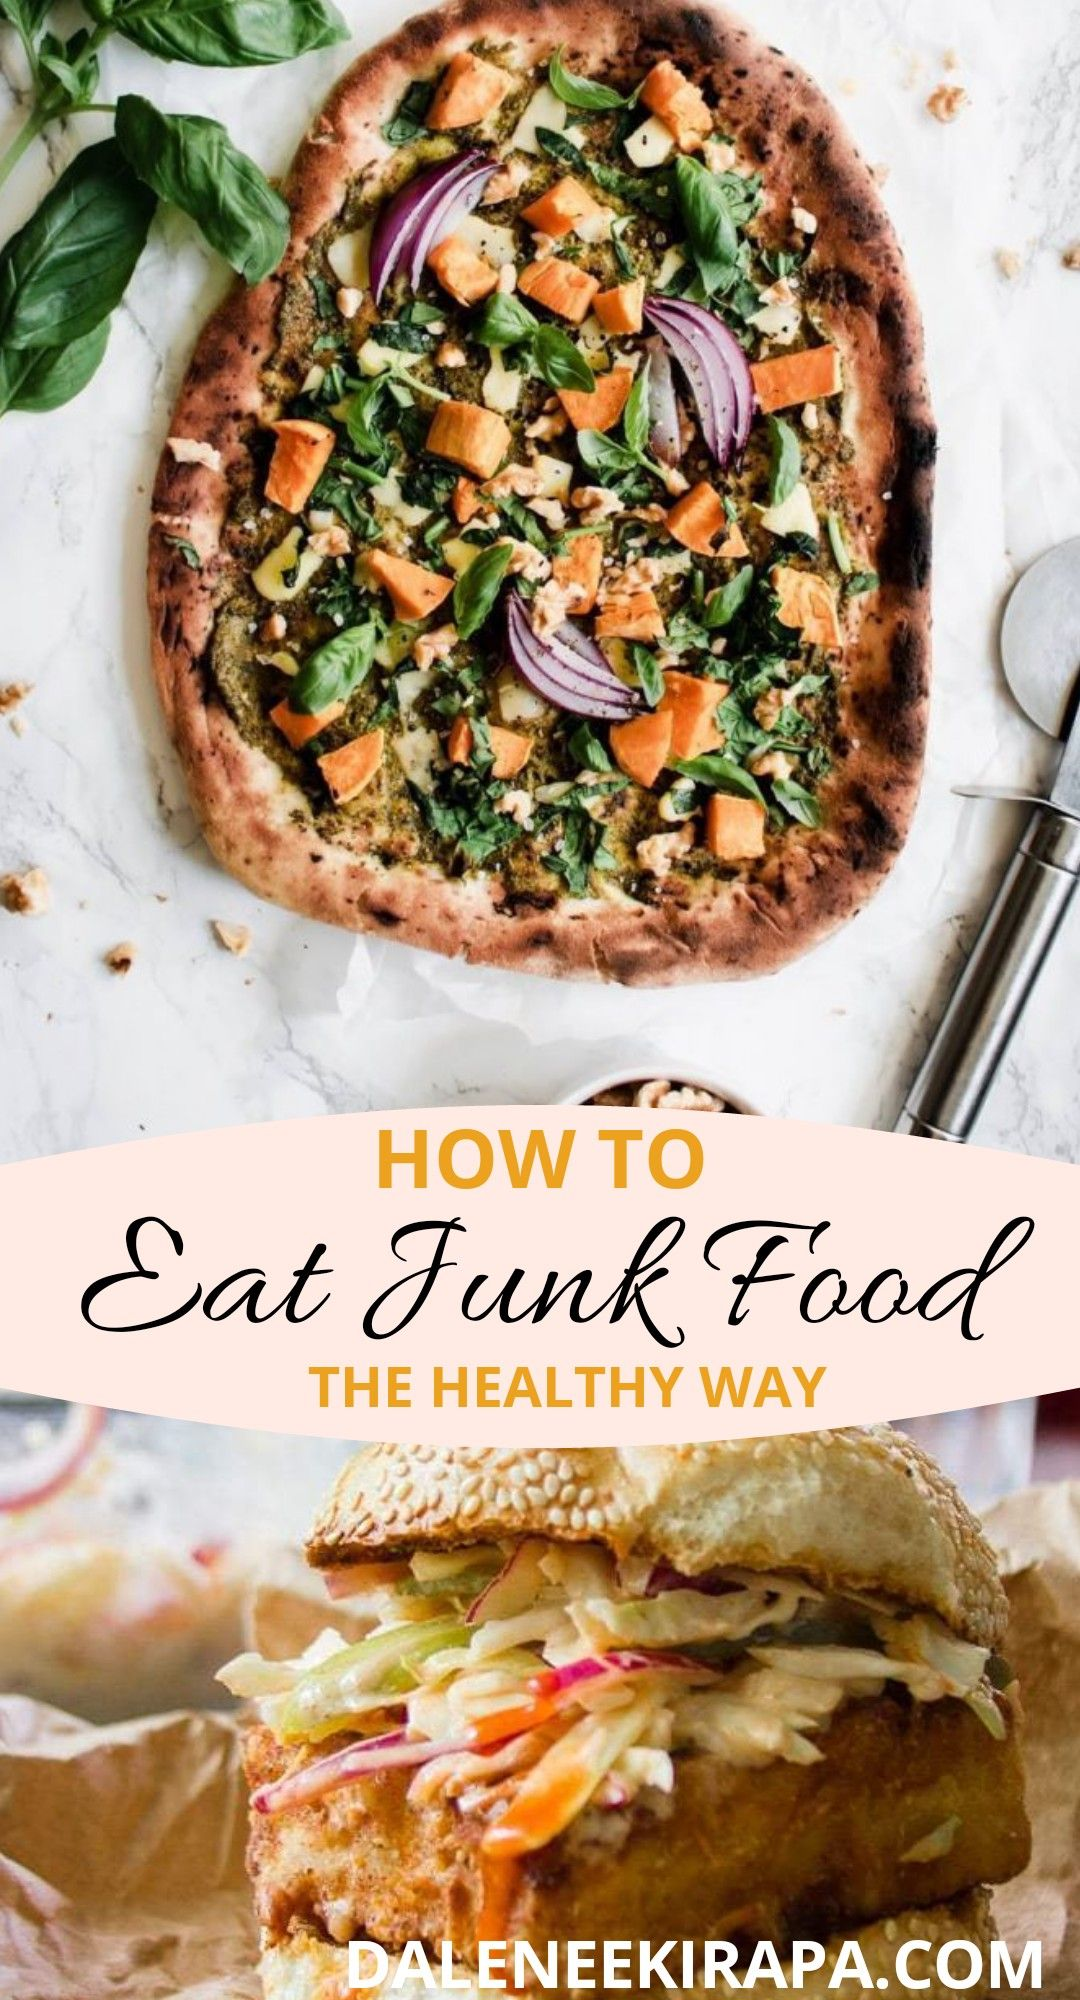 Love Junk Food These Vegan Junk Food Recipes Will Suit Your Cravings Homes N Away Healthy Junk Food Vegan Junk Food Healthy Junk